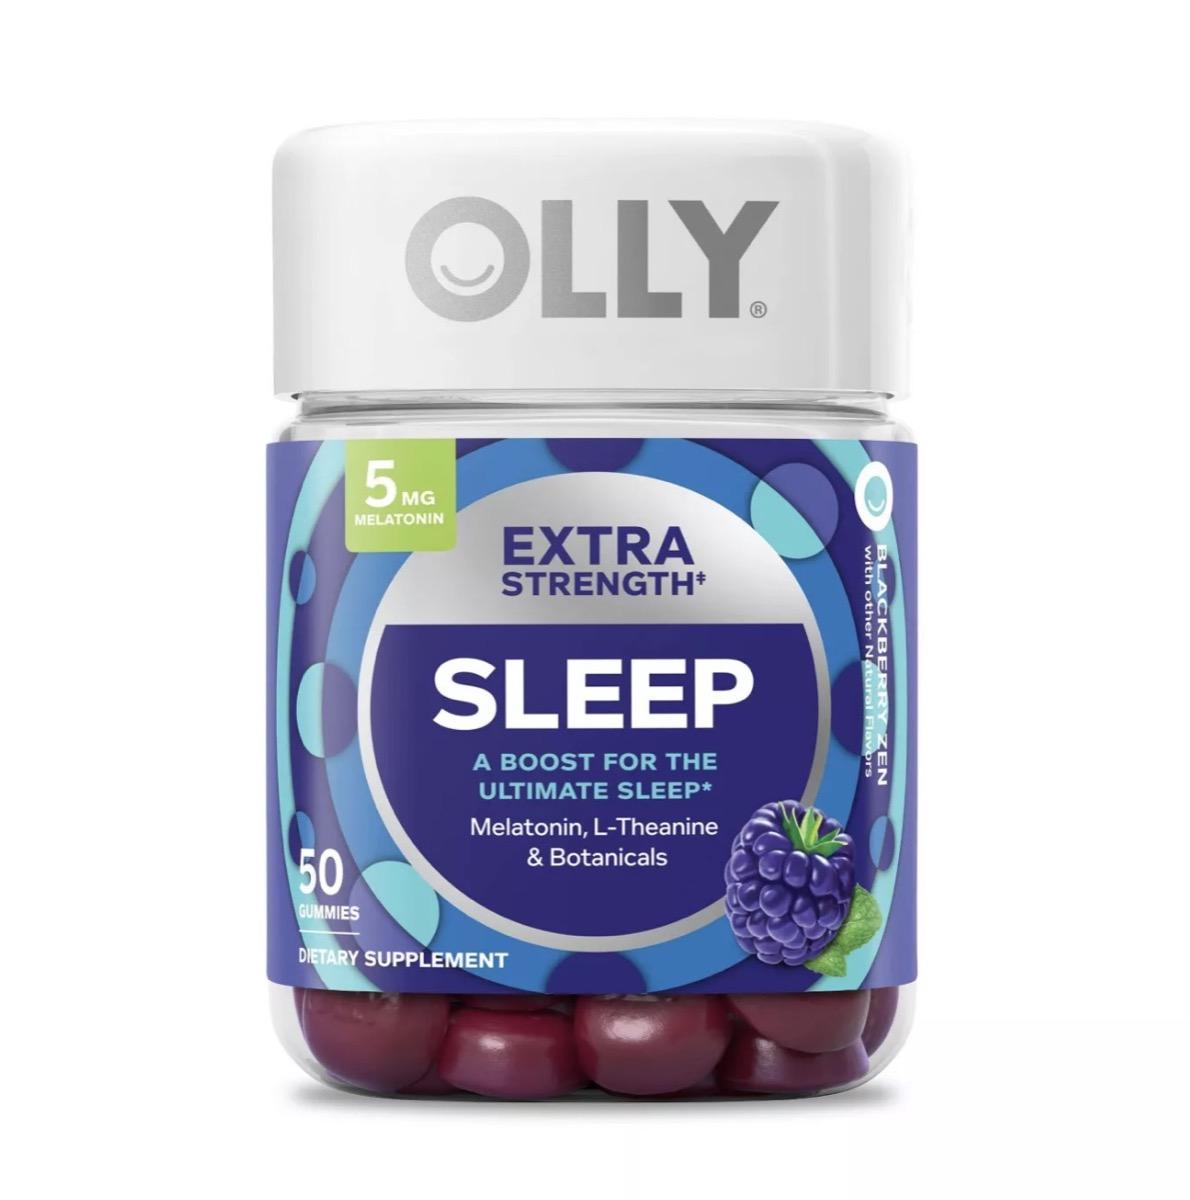 bottle of melatonin gummies, better sleep essentials